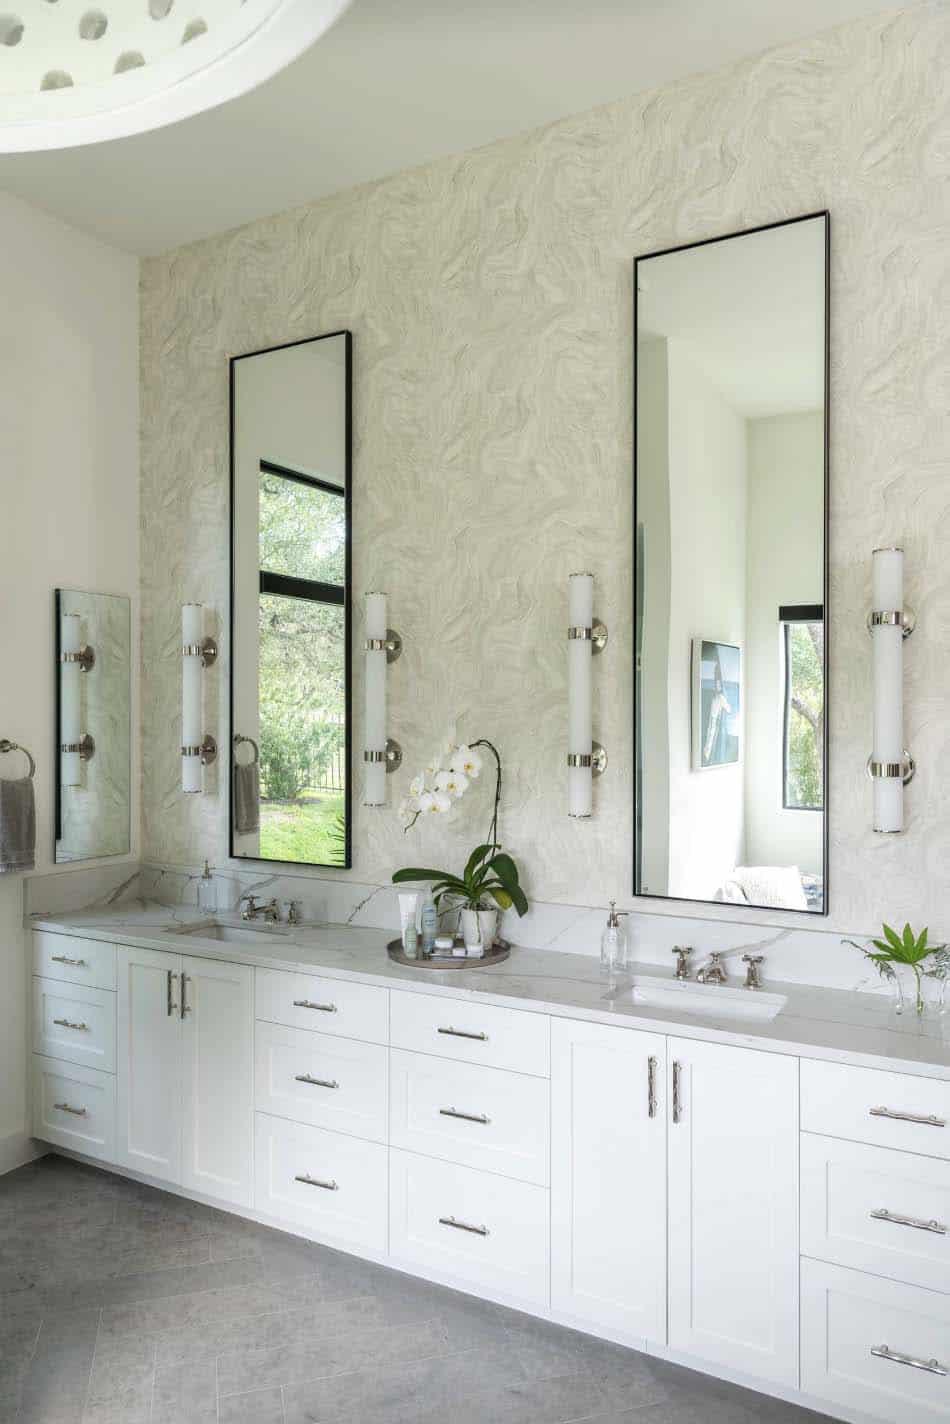 Modern farmhouse style in Texas showcases fantastic design ... on Modern Farmhouse Shower  id=75806